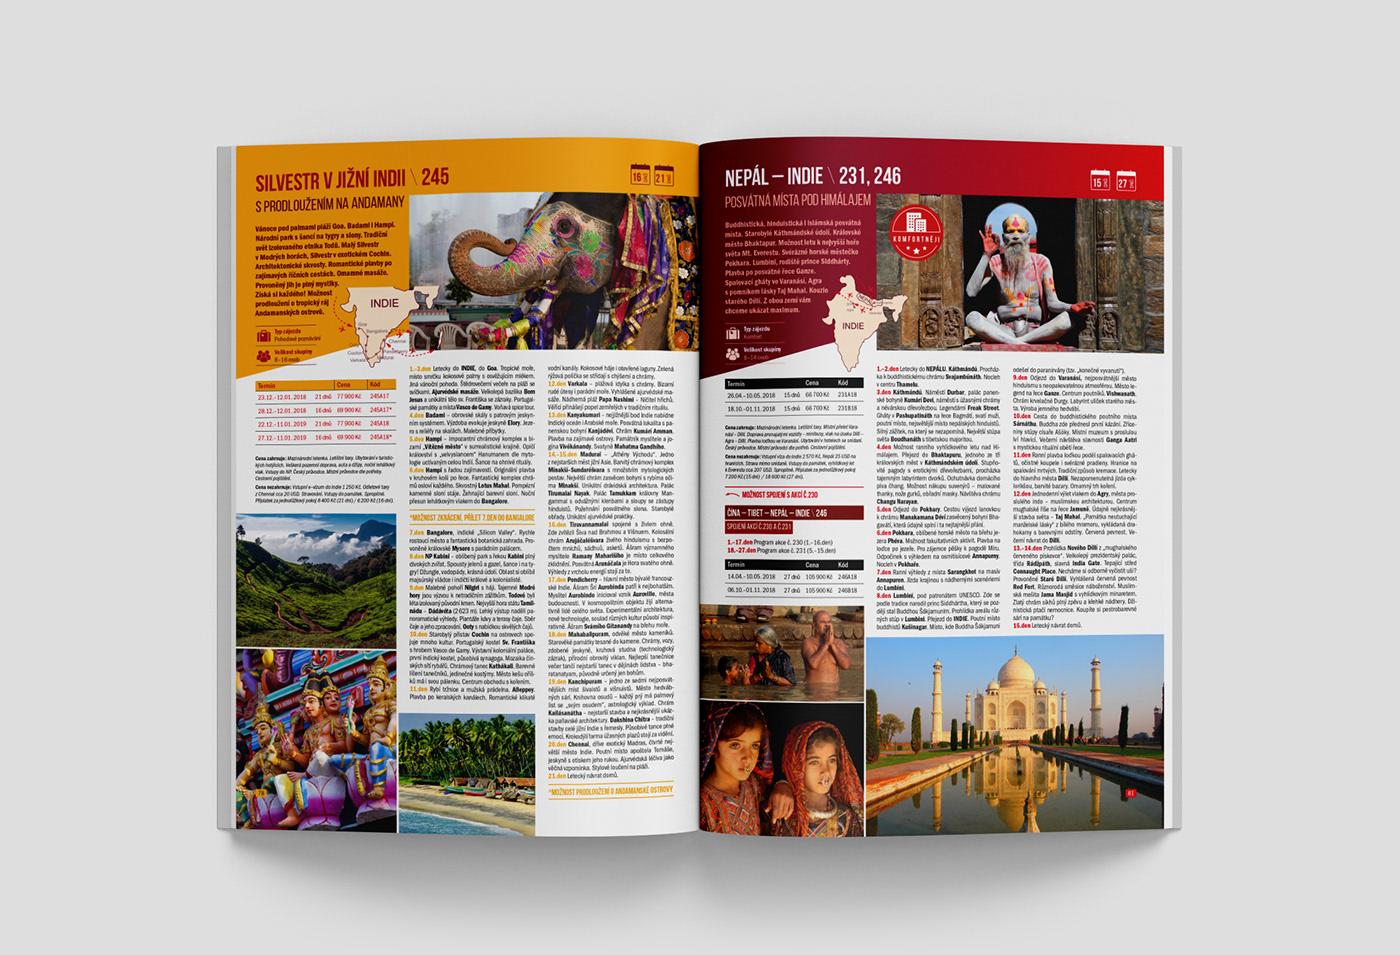 david navratil design exotic livingstone print Travel travel agency Younick catalog